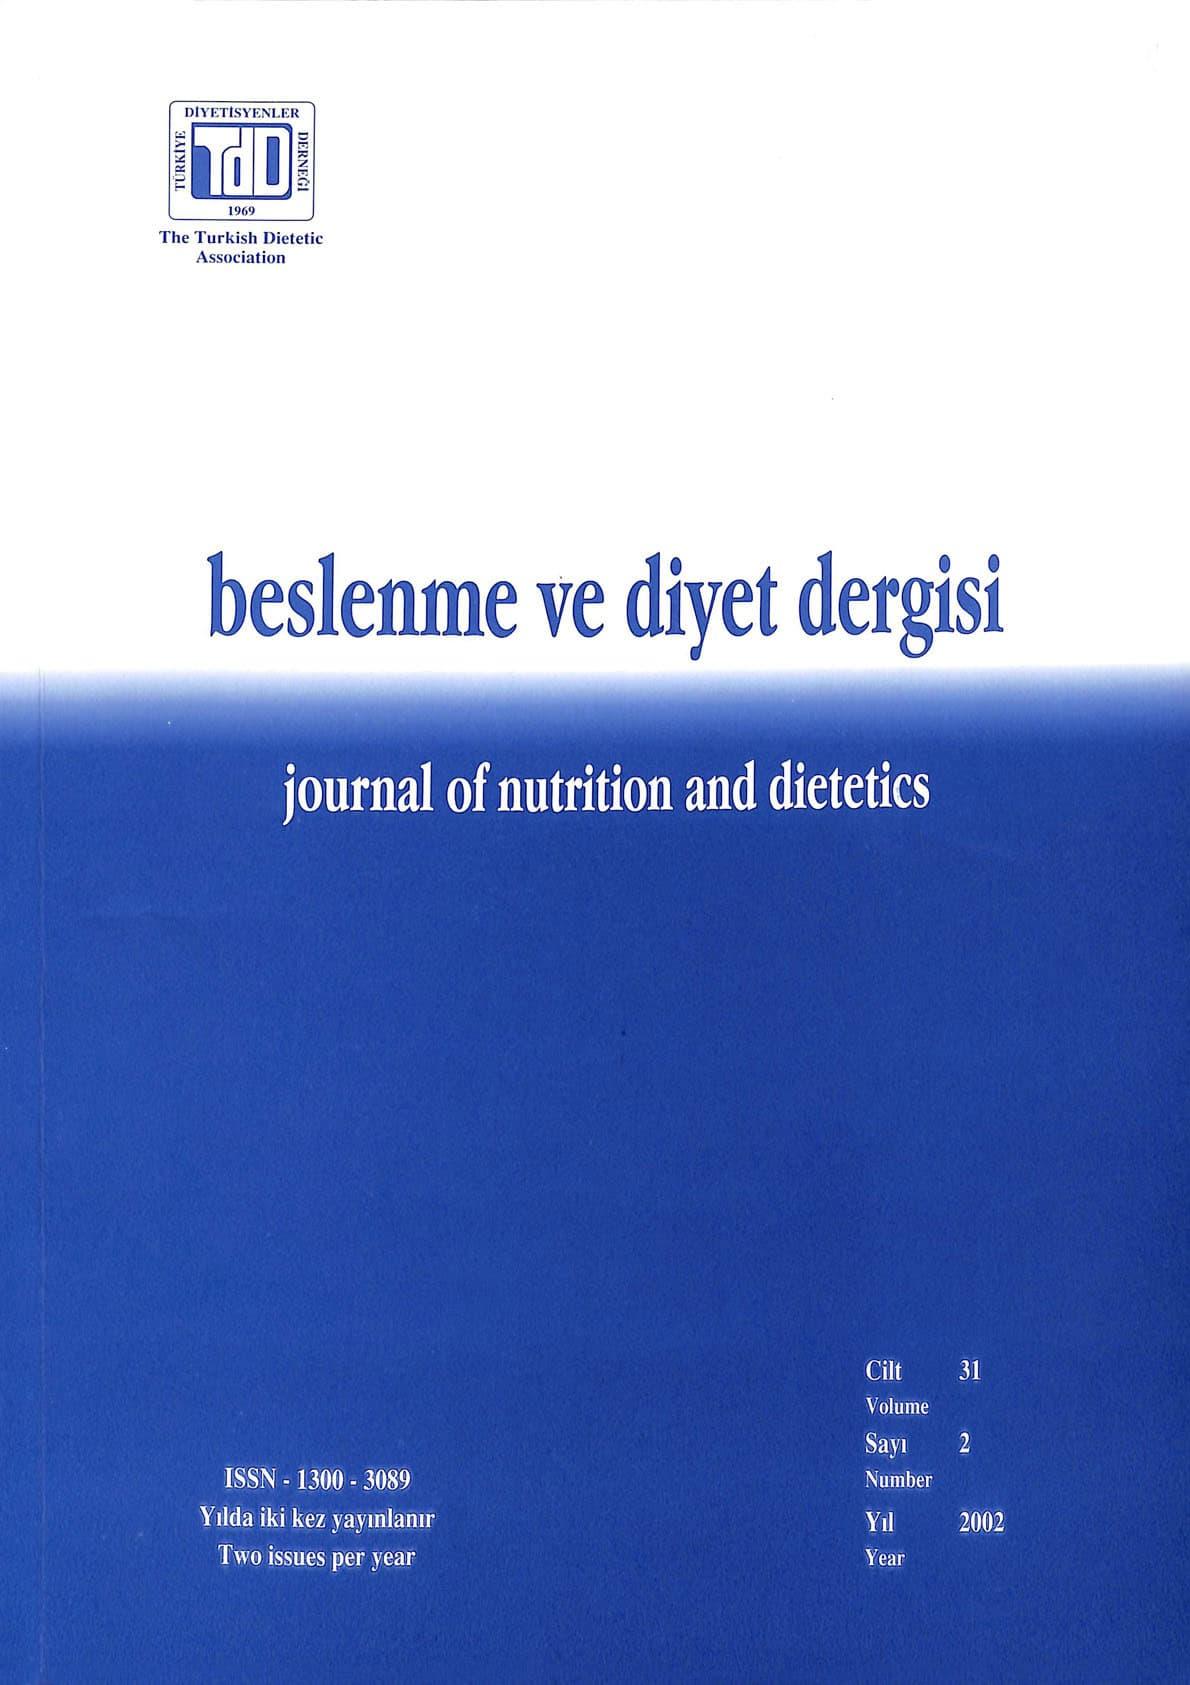 Cilt 31 Sayı 2 (2002)